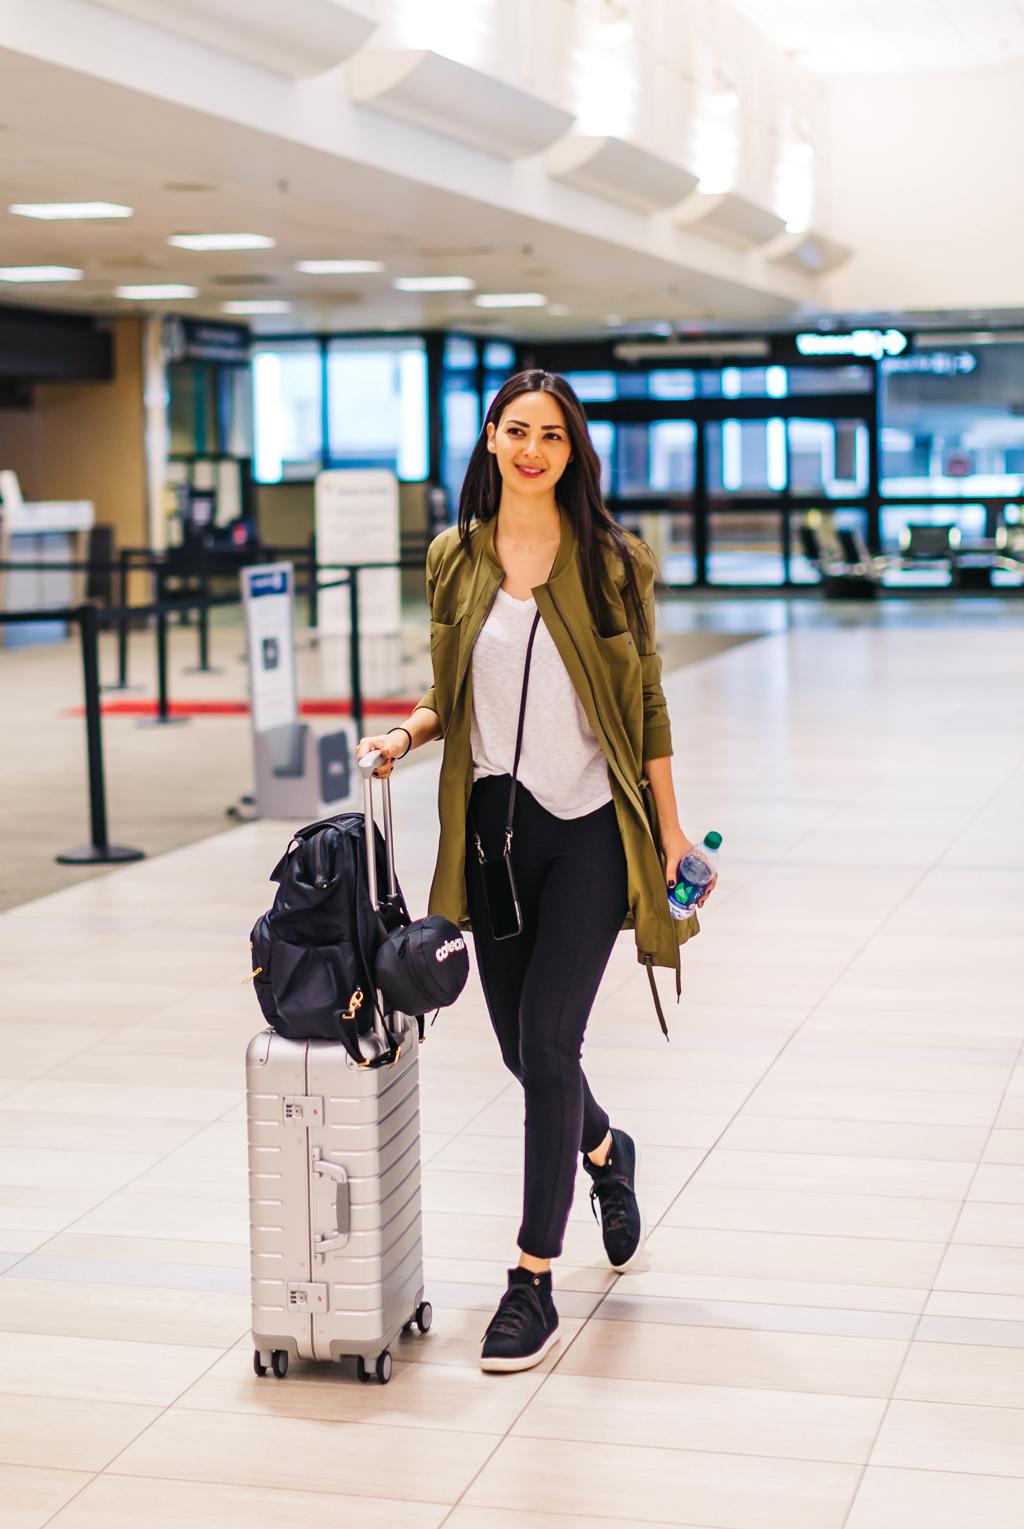 Away Bigger Carryon Suitcase    //    Anatomie Jacket & Fleece Leggings